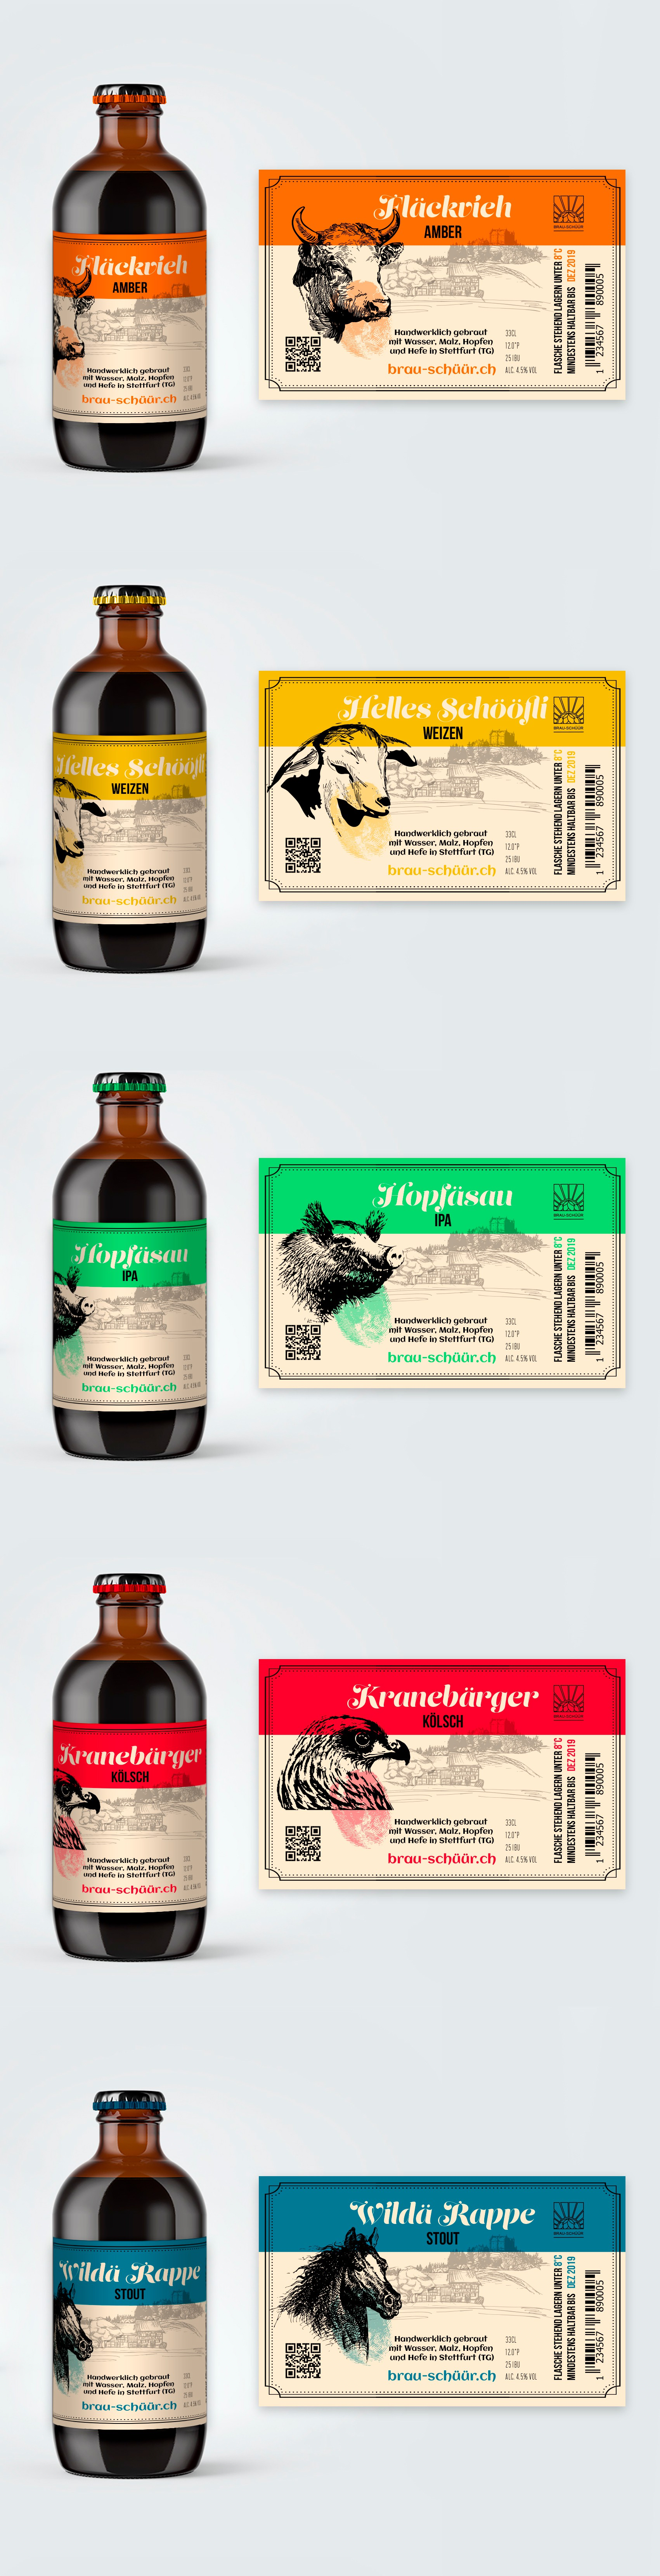 Design a unique beer brand.